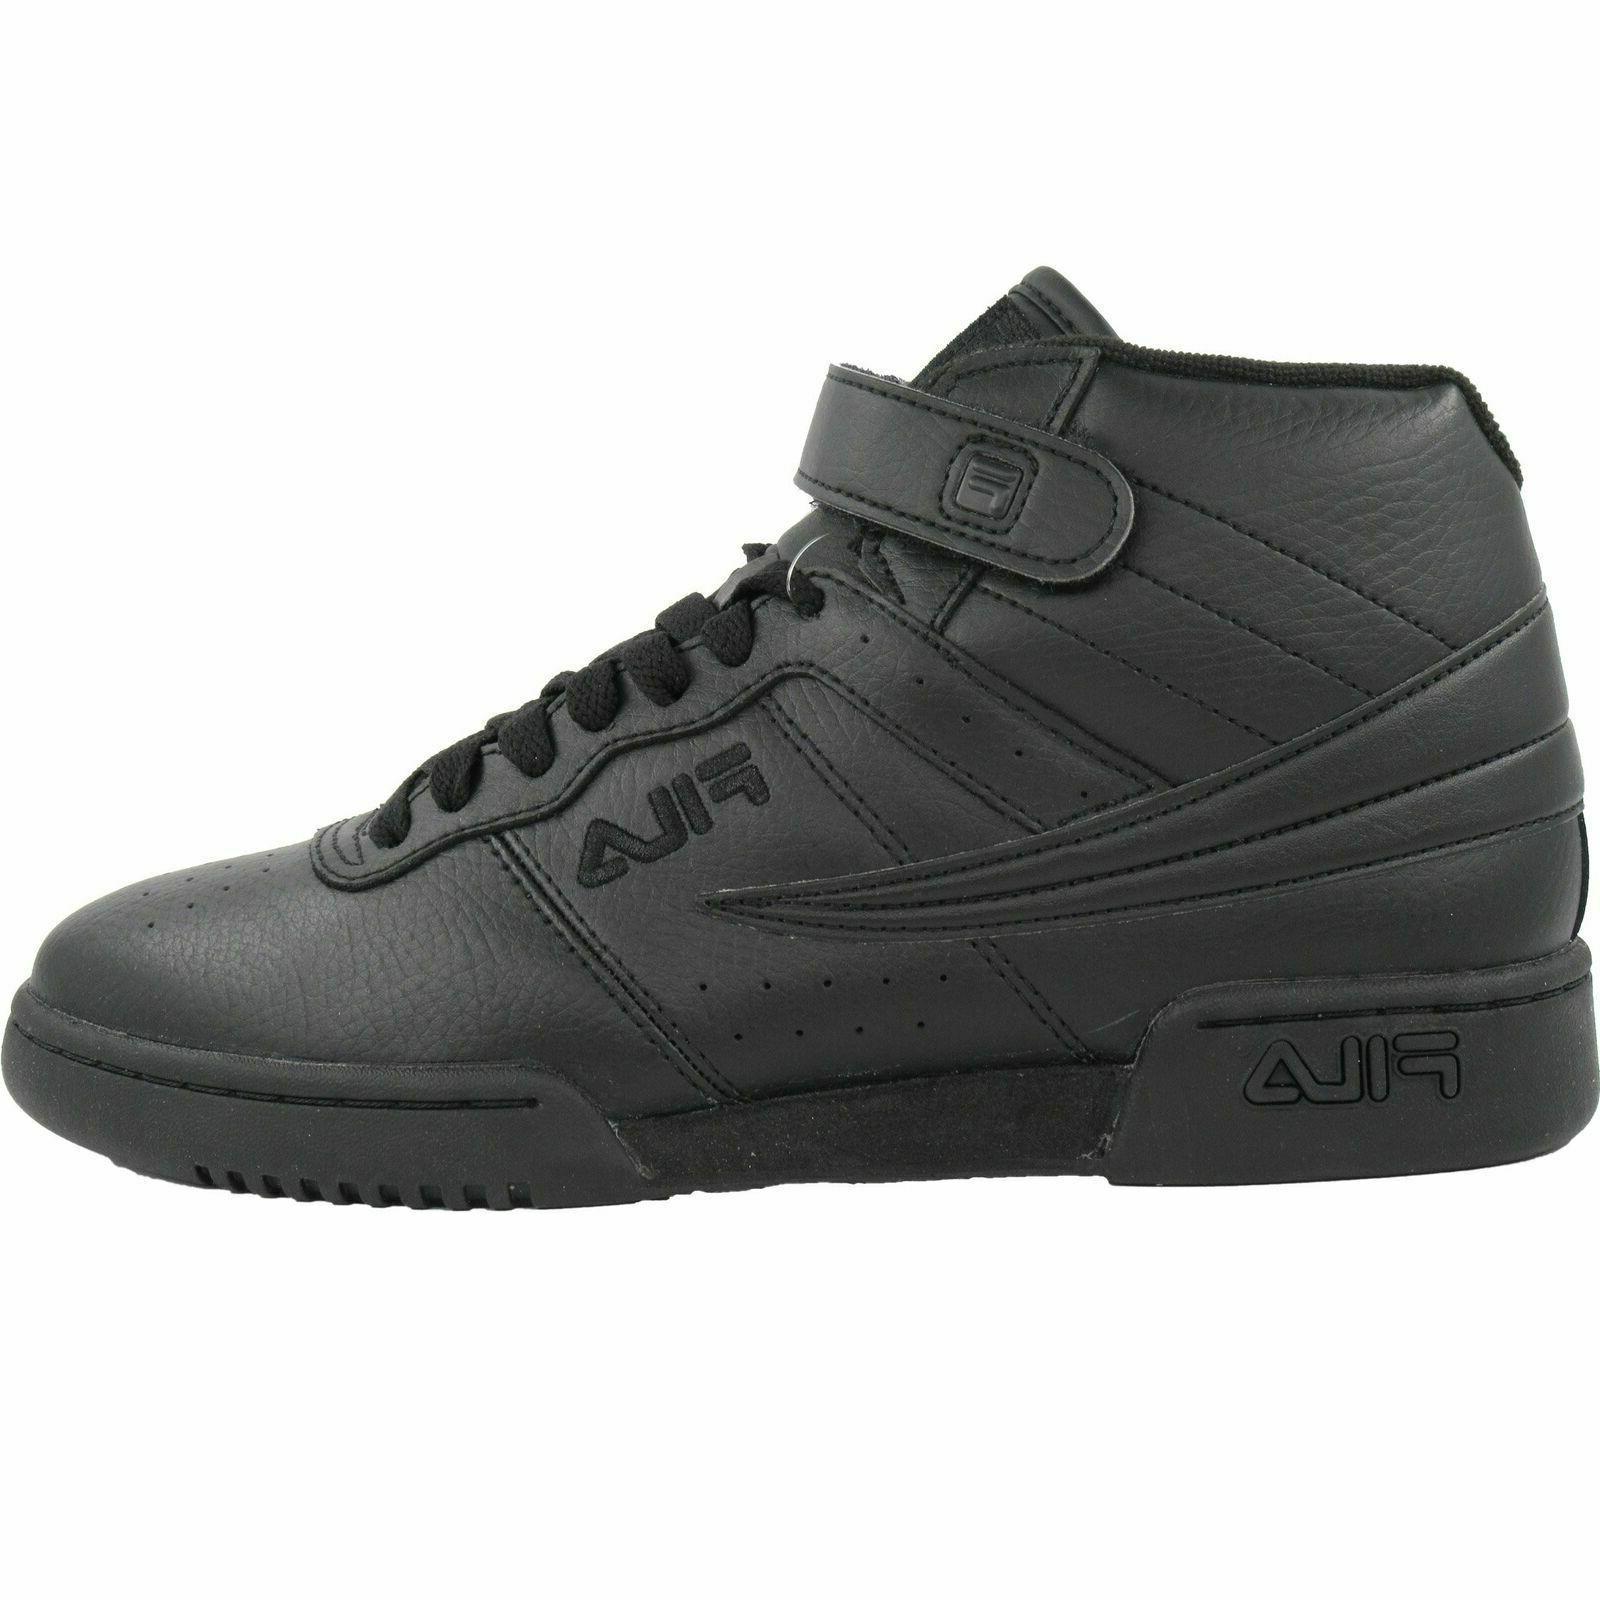 Mens Fila F-13 Classic Mid Basketball Sneakers Black